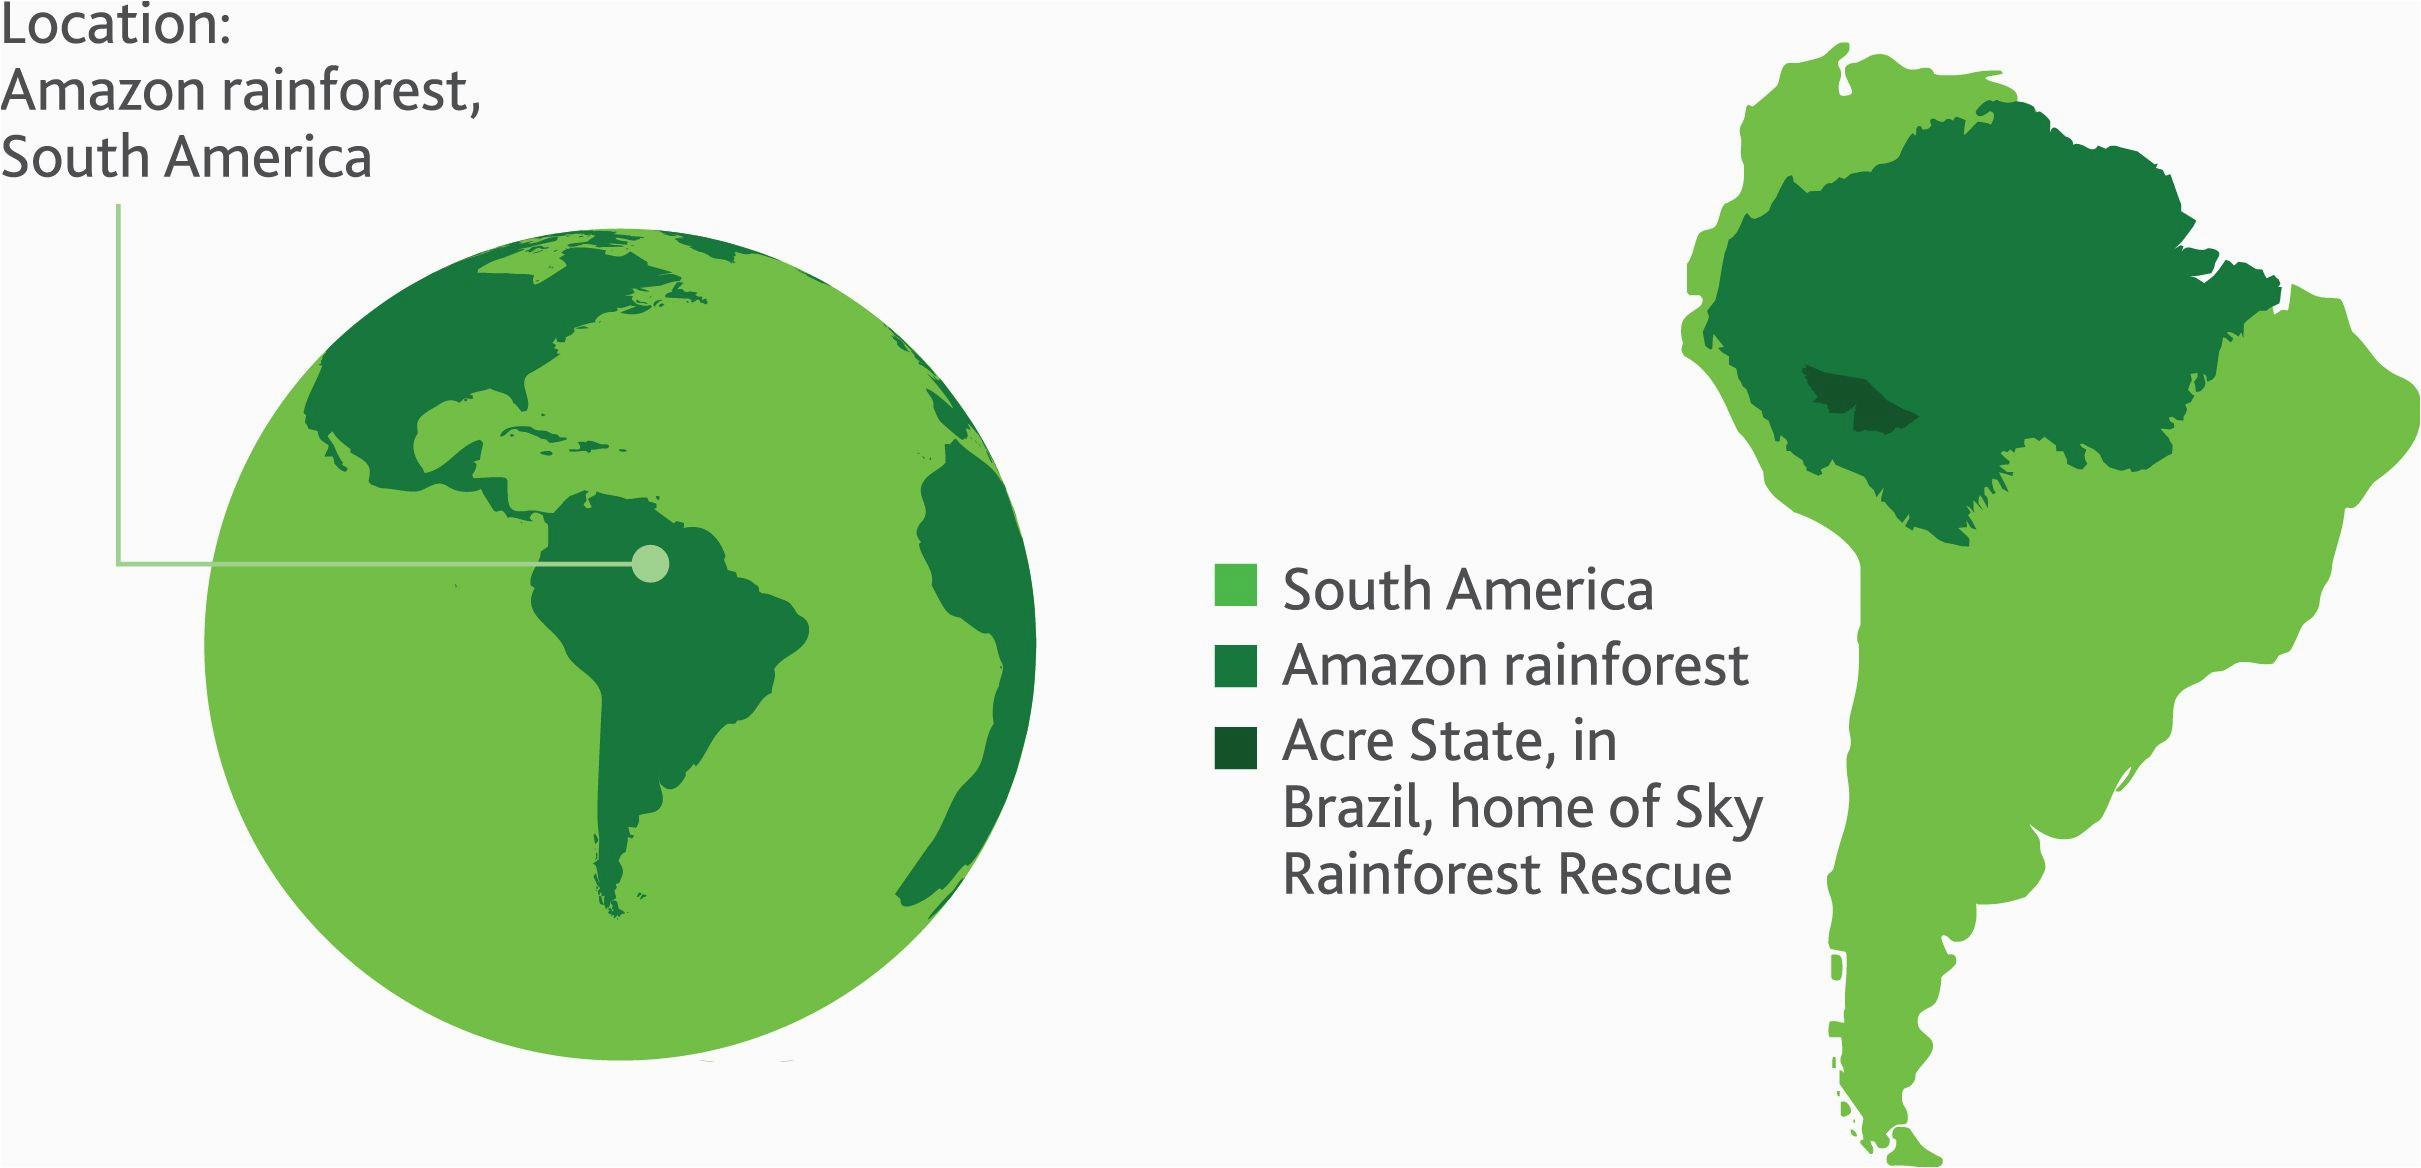 amazon rainforest map google search south america amazon